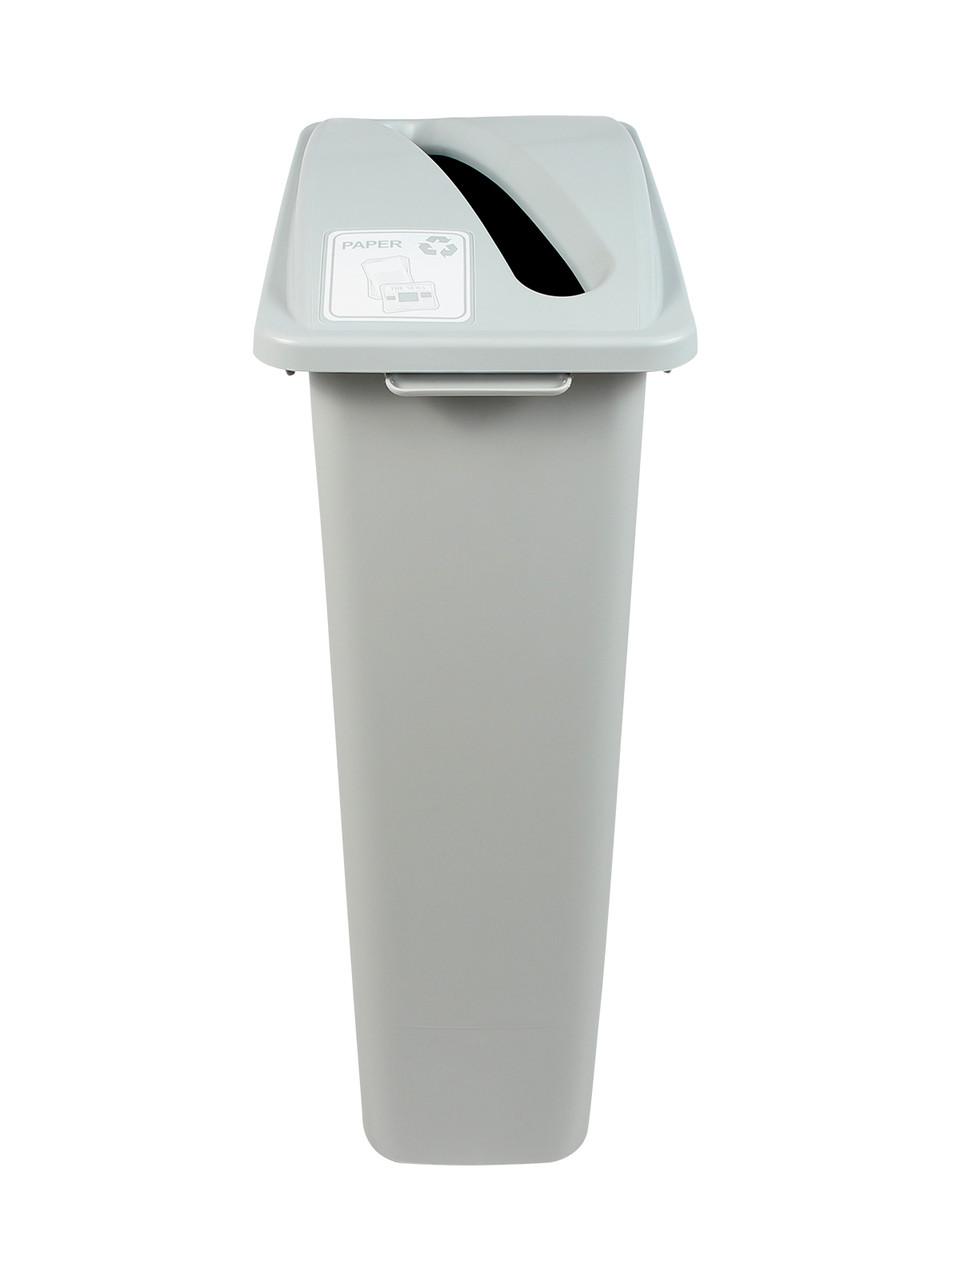 23 Gallon Gray Simple Sort Recycle Bin (Paper)